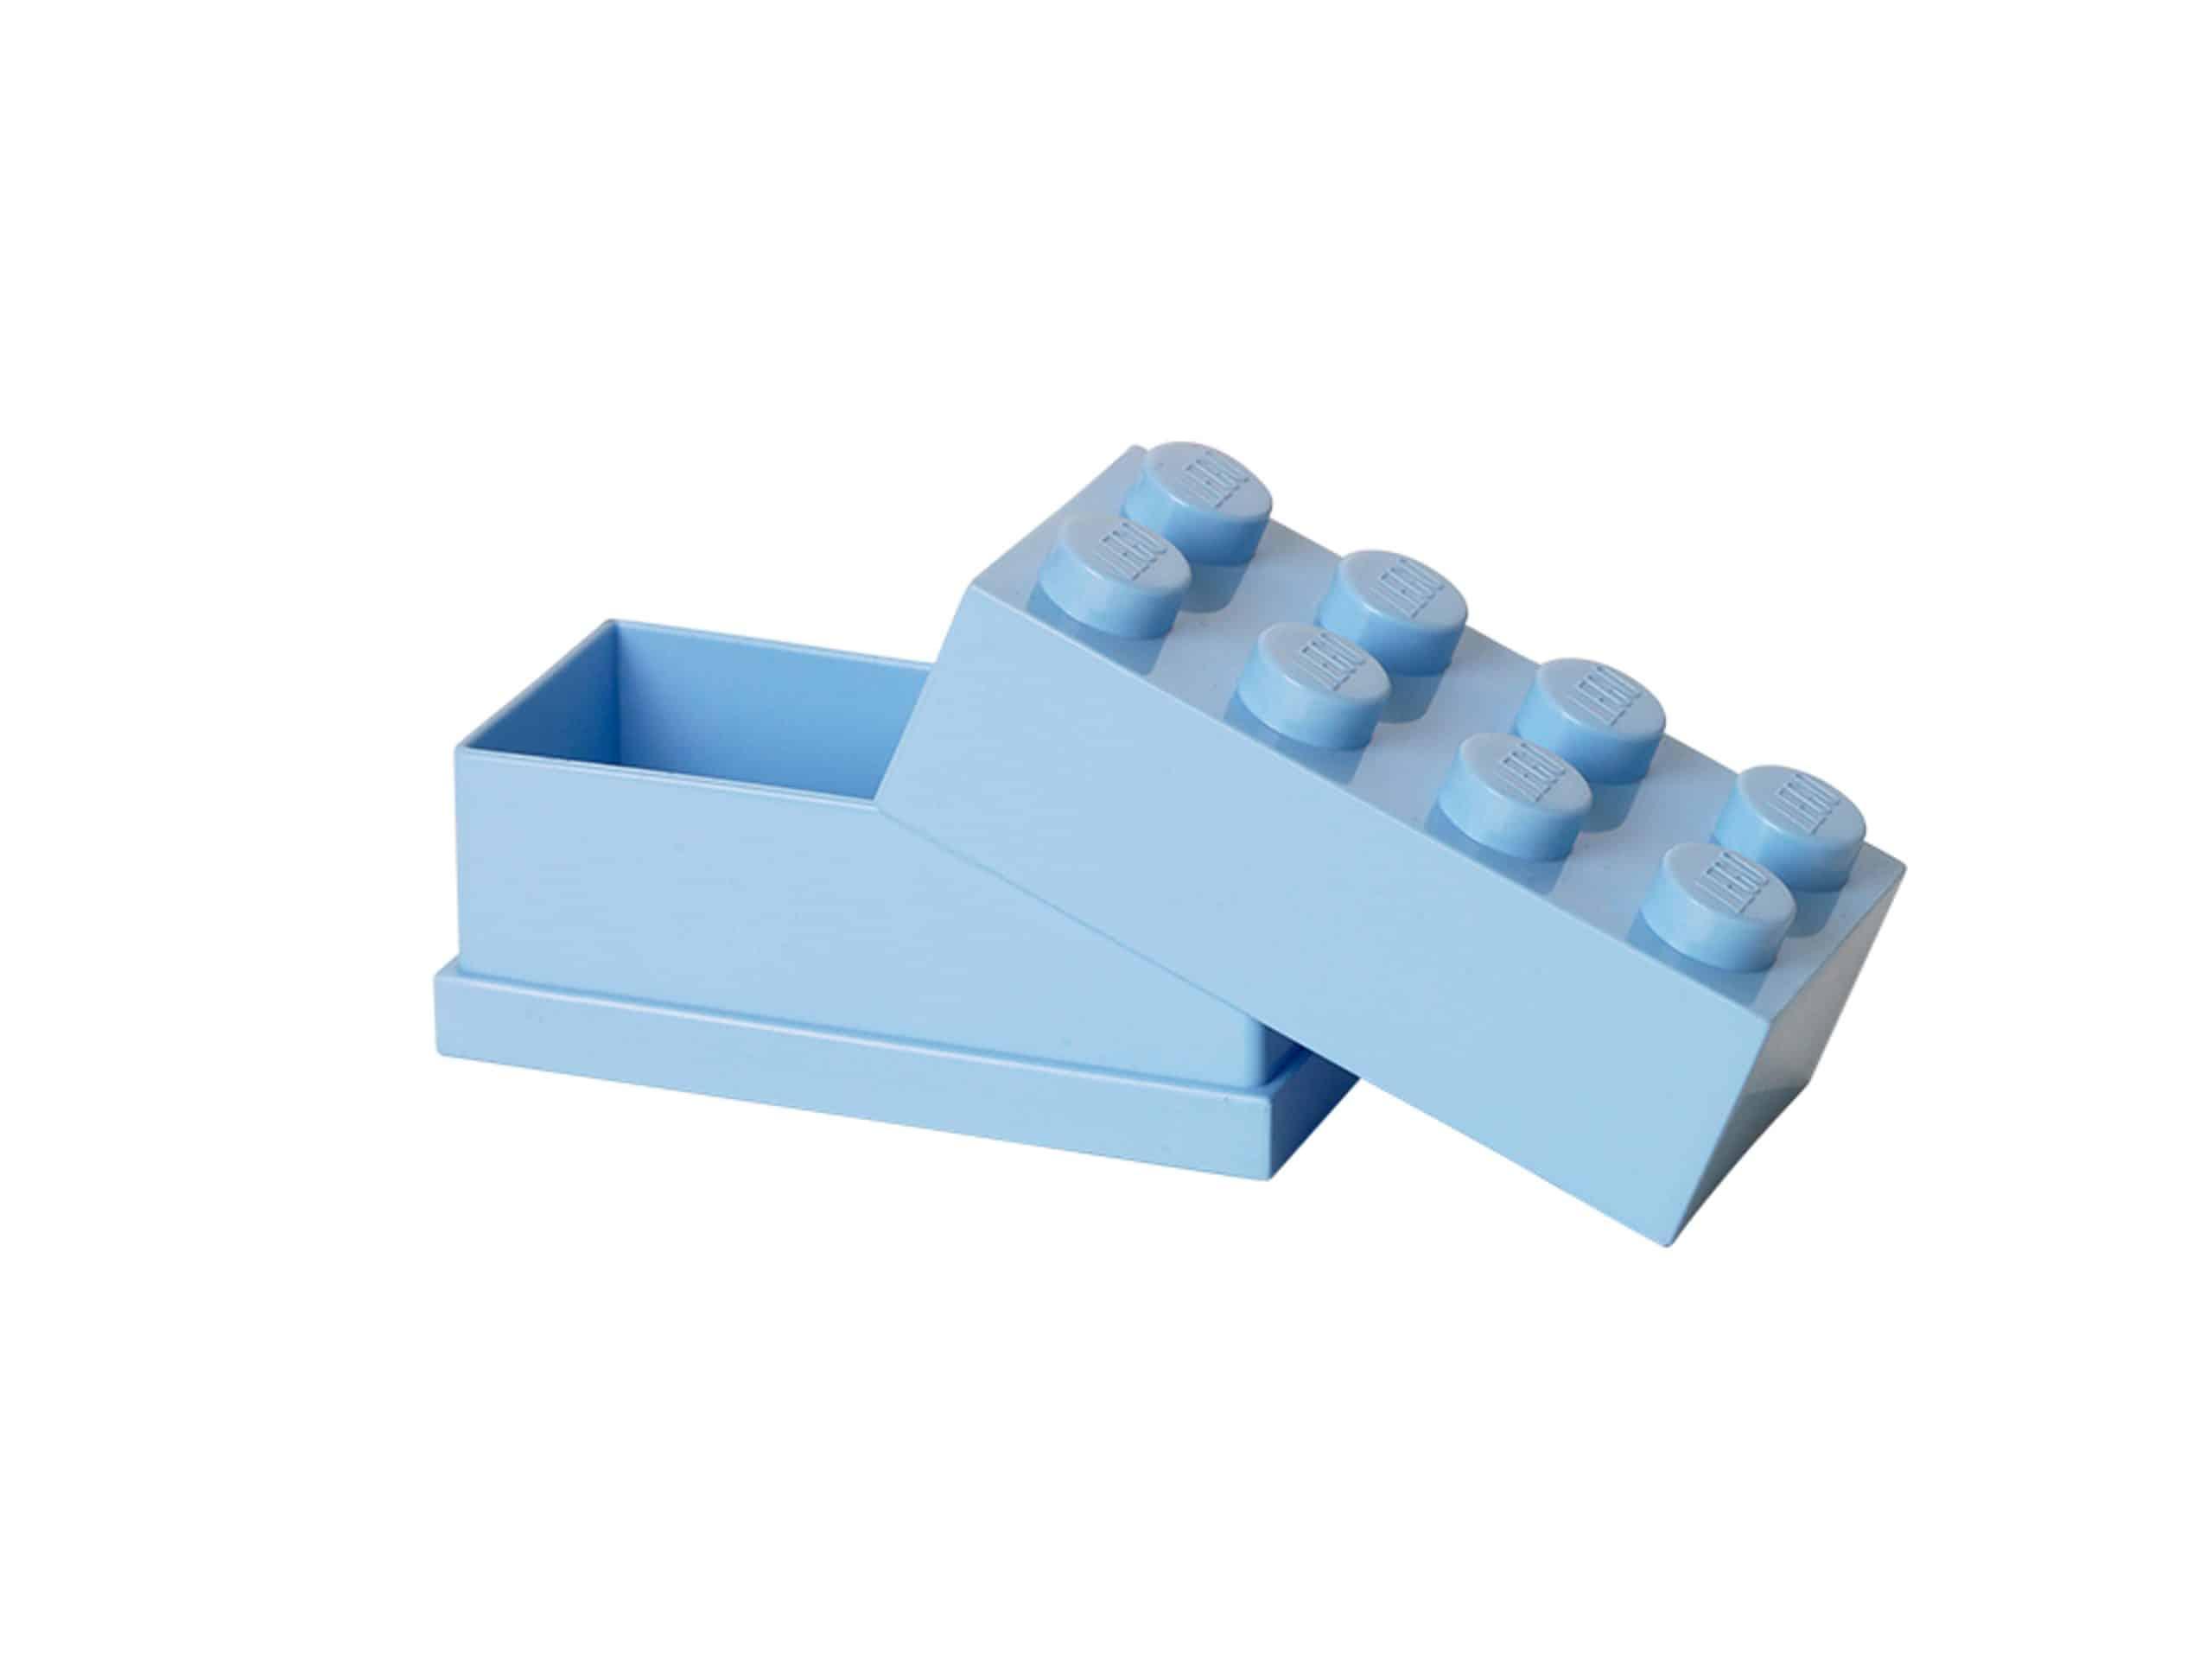 mini boite a 8 tenons lego 5001286 scaled